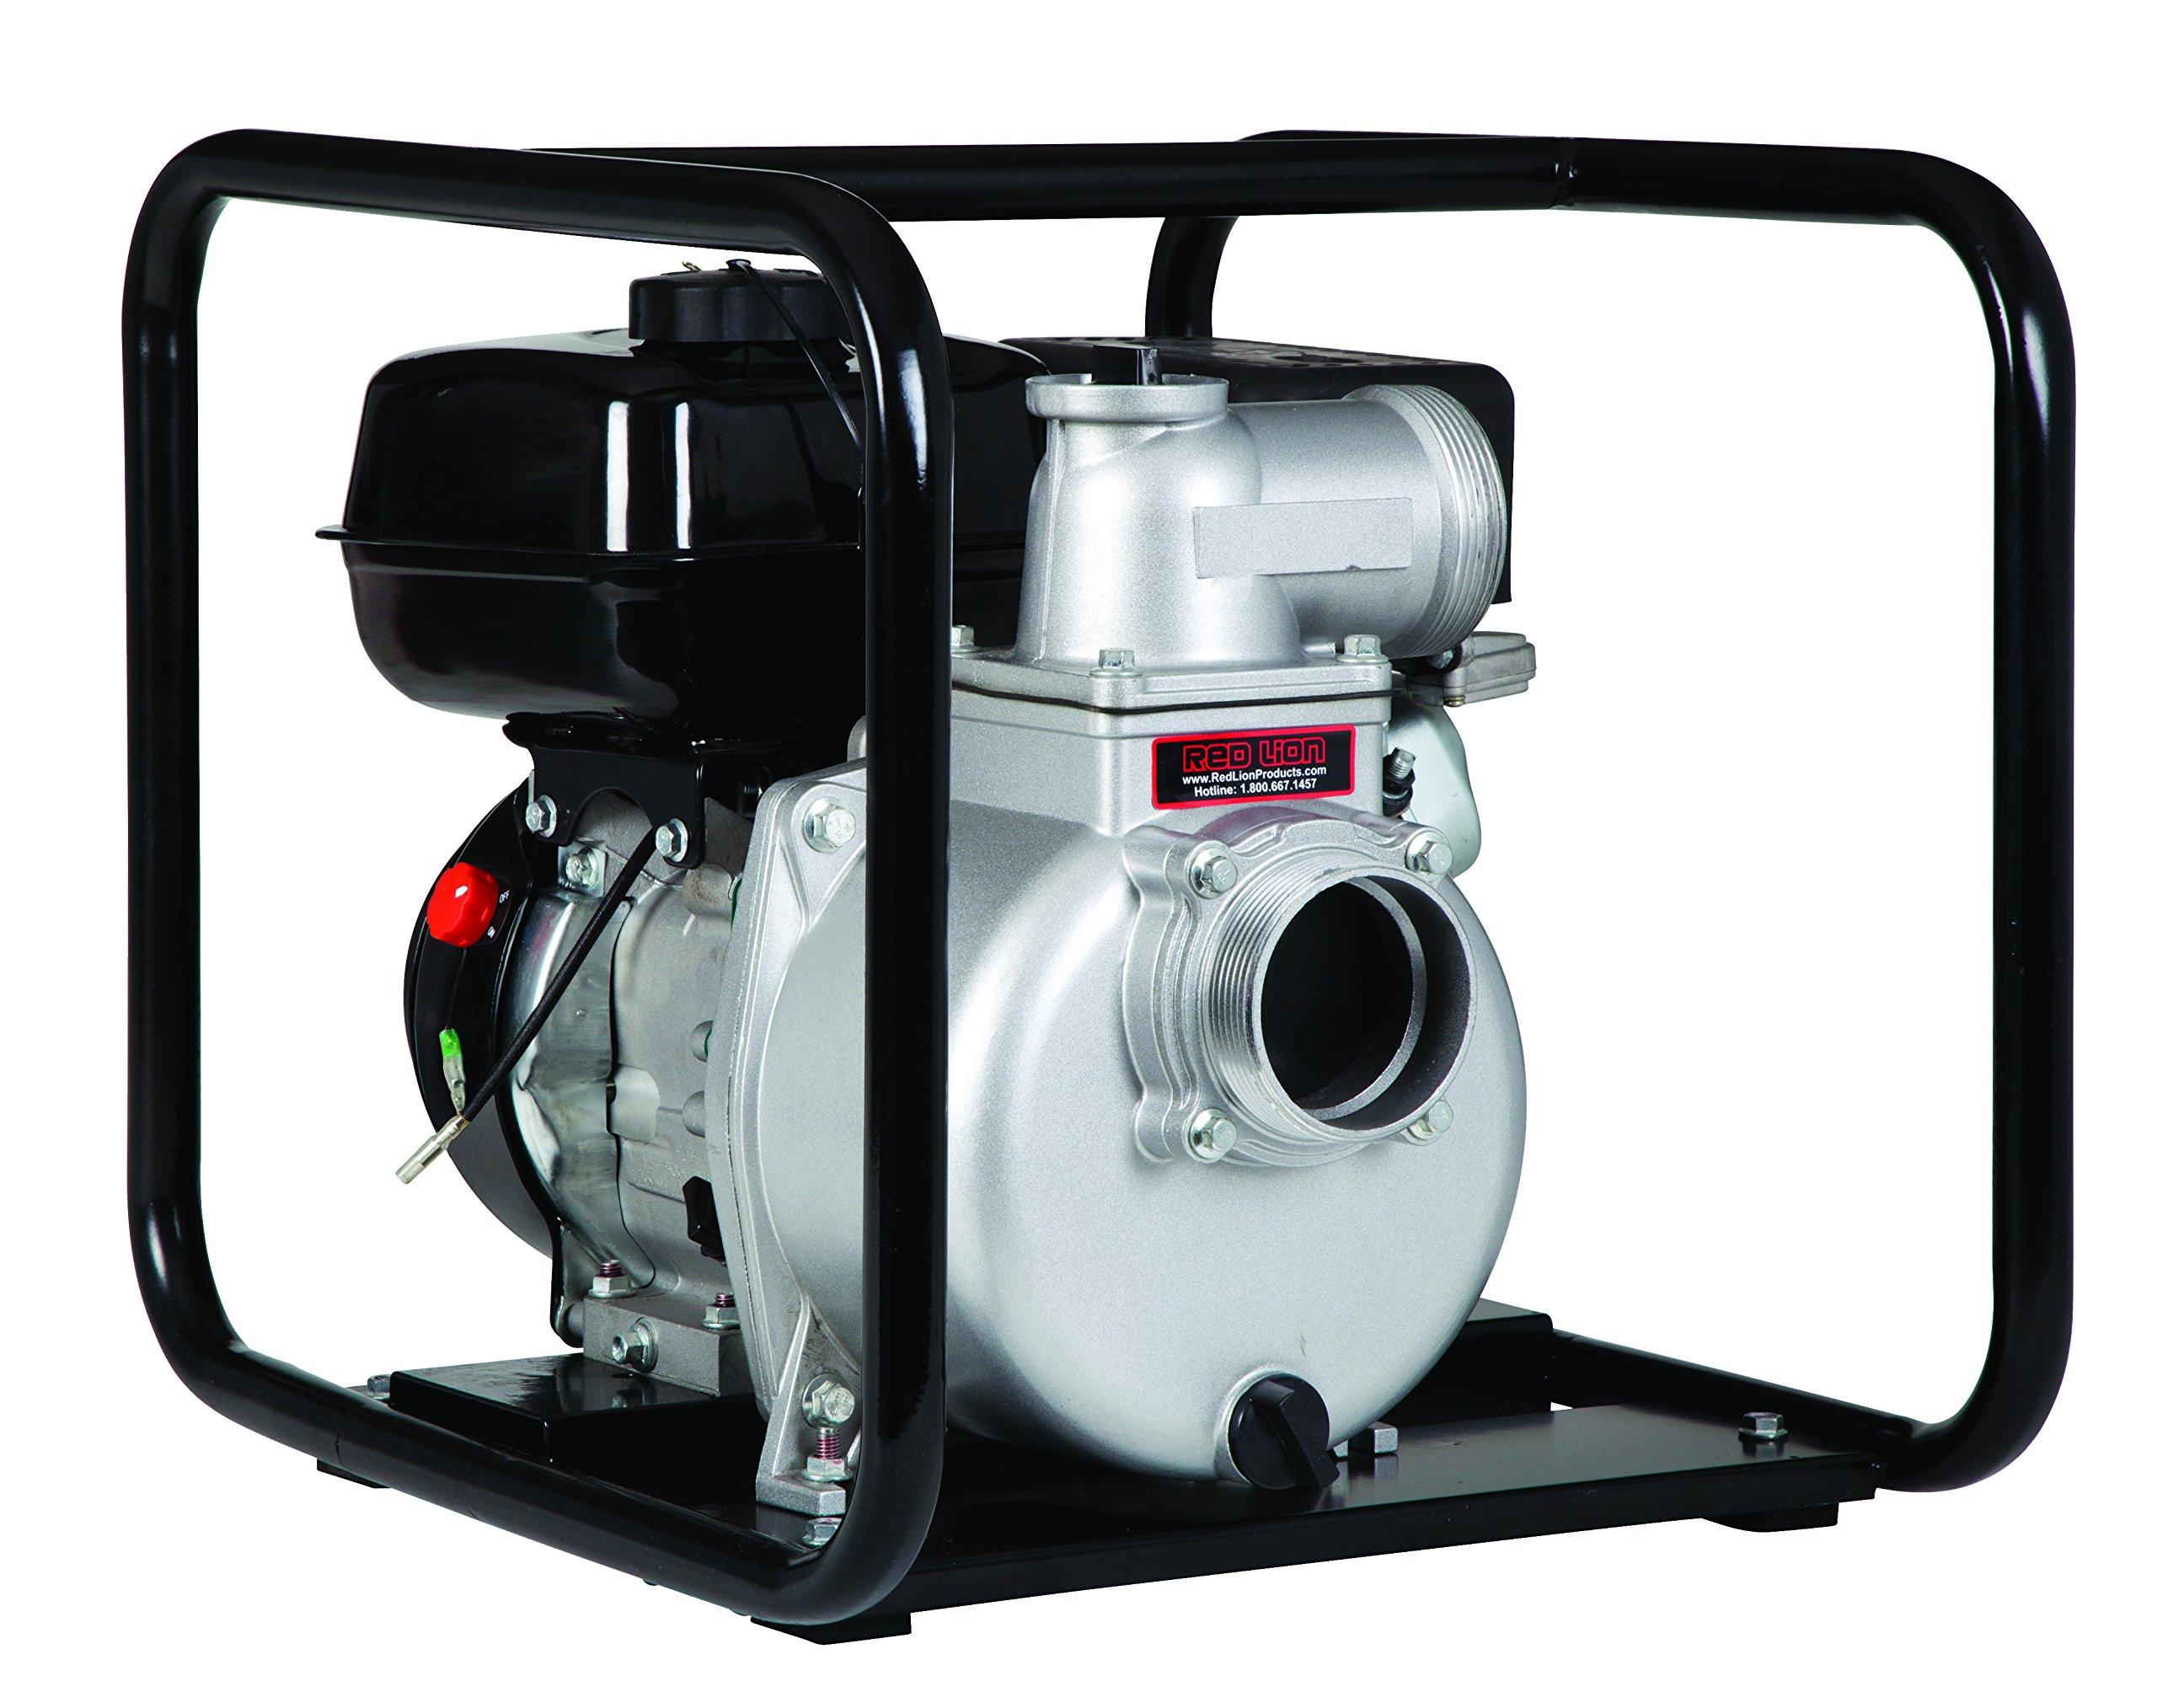 Red Lion 6RLAG-3ST 6-HP OHV Engine Driven NPT Semi-Trash Pump, 3-Inch